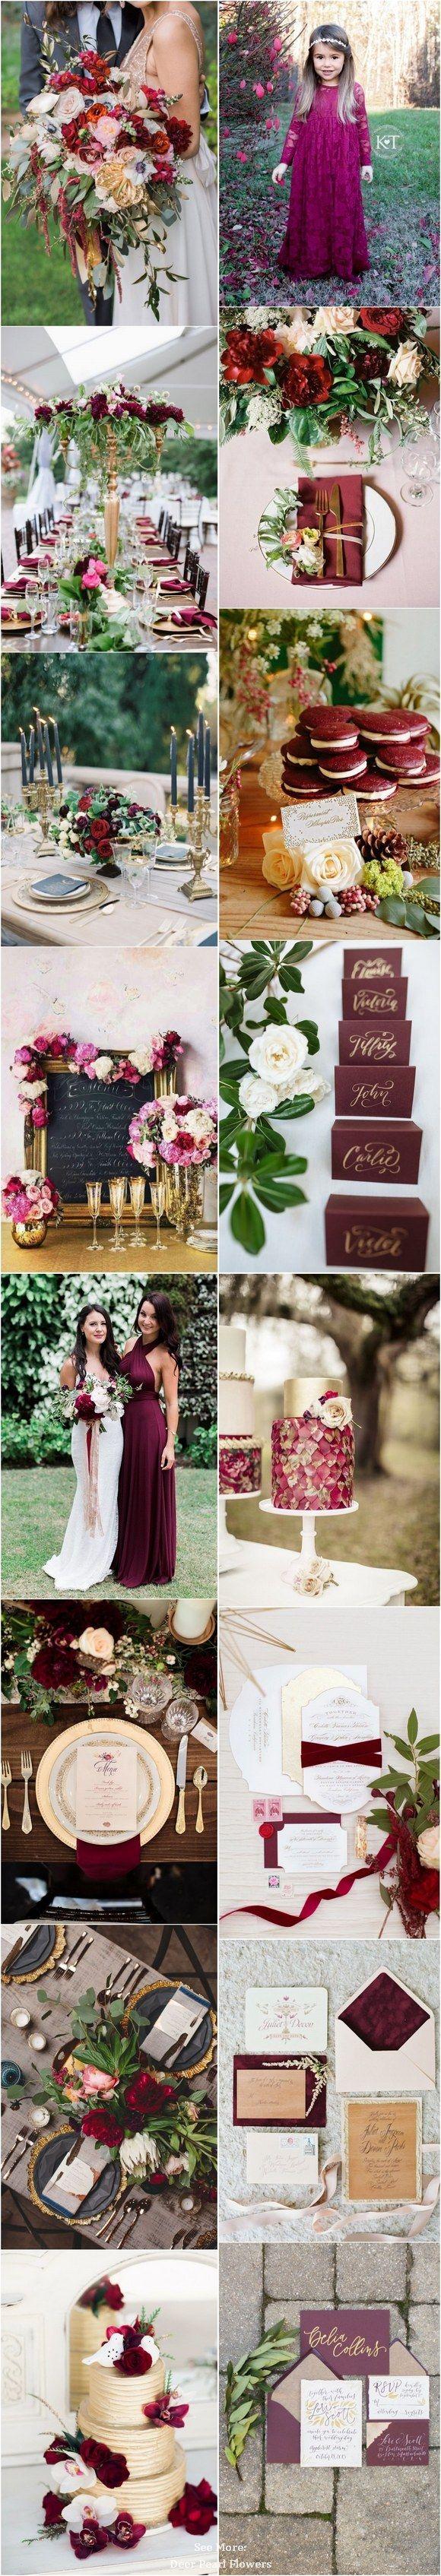 Maroon and cream wedding decor   best Weddings images on Pinterest  Wedding ideas Bridal and